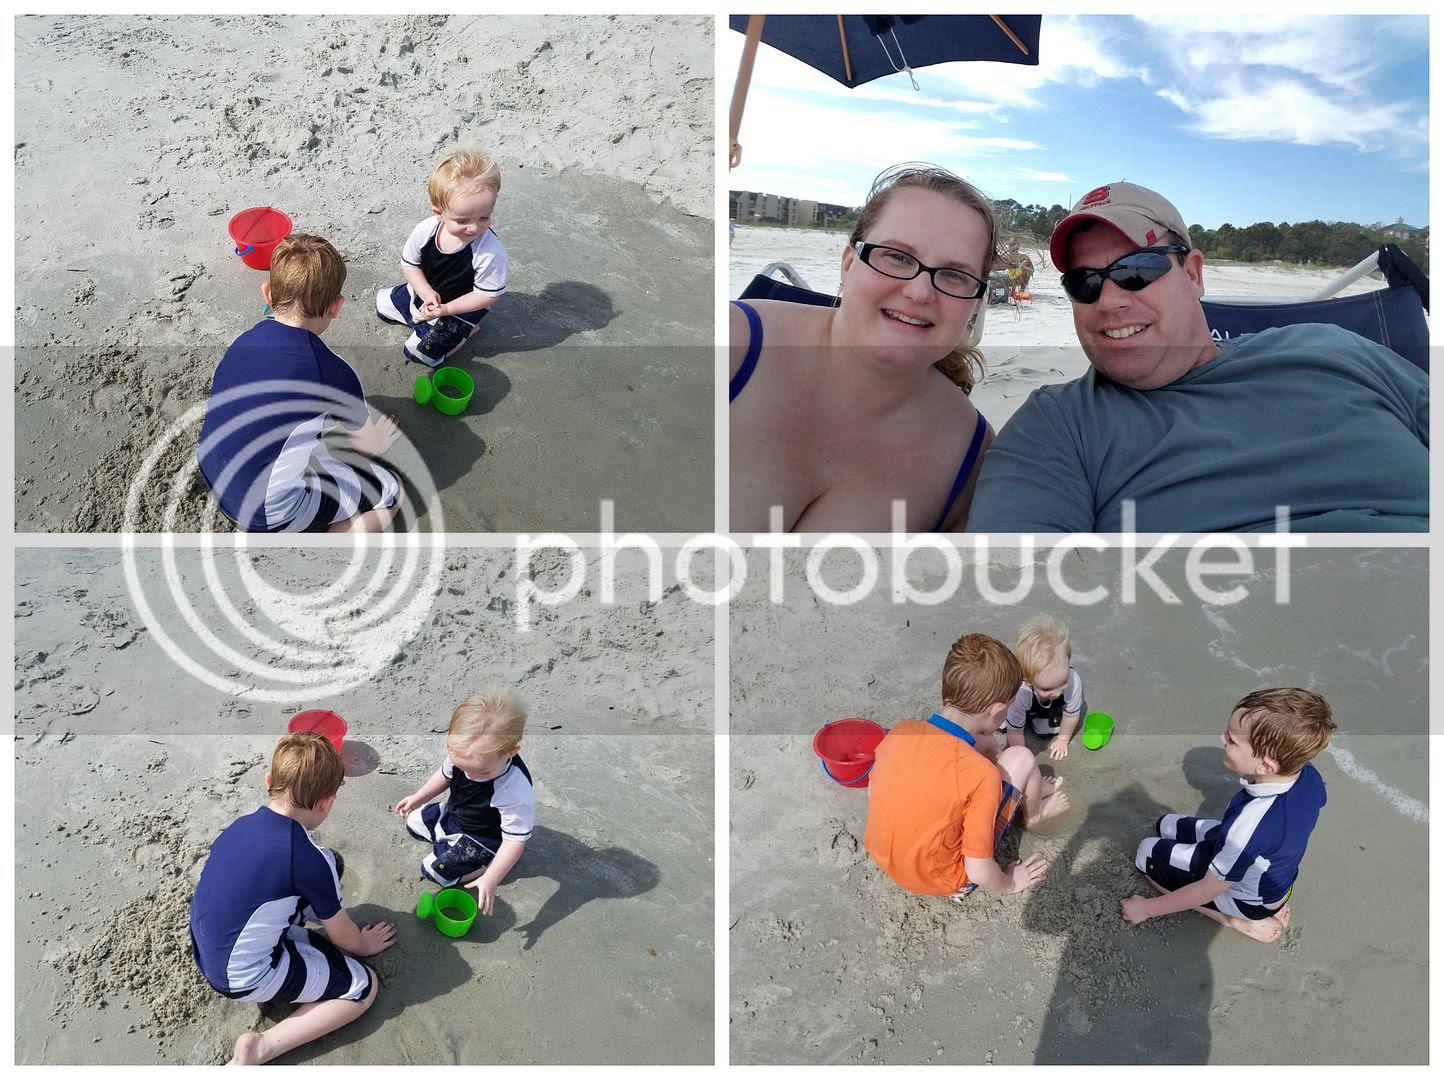 photo beach3_zpsba9av9zf.jpg